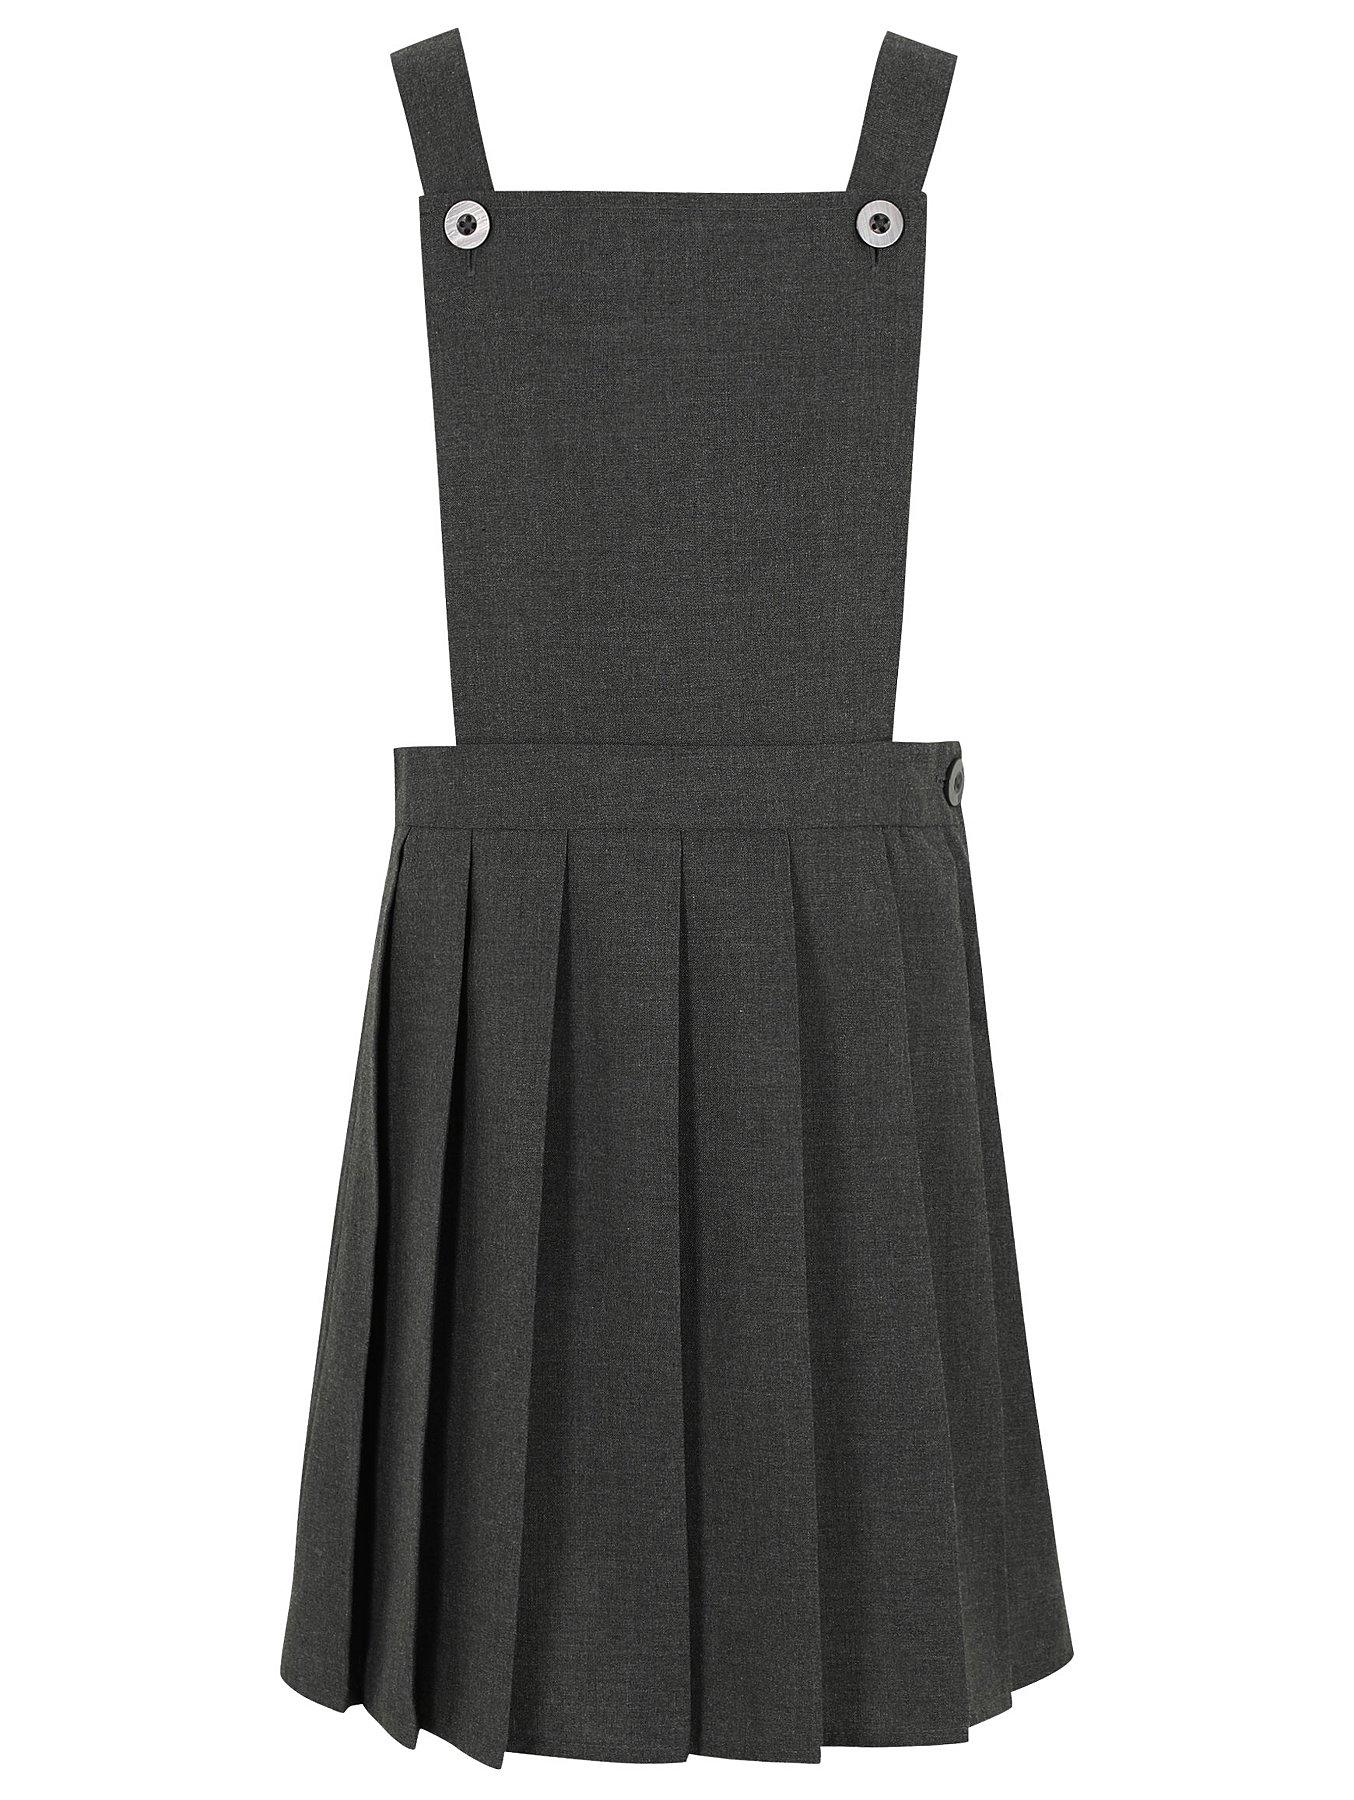 b1a4430008 Girls Grey Bib Top Pleated School Pinafore Dress   School   George